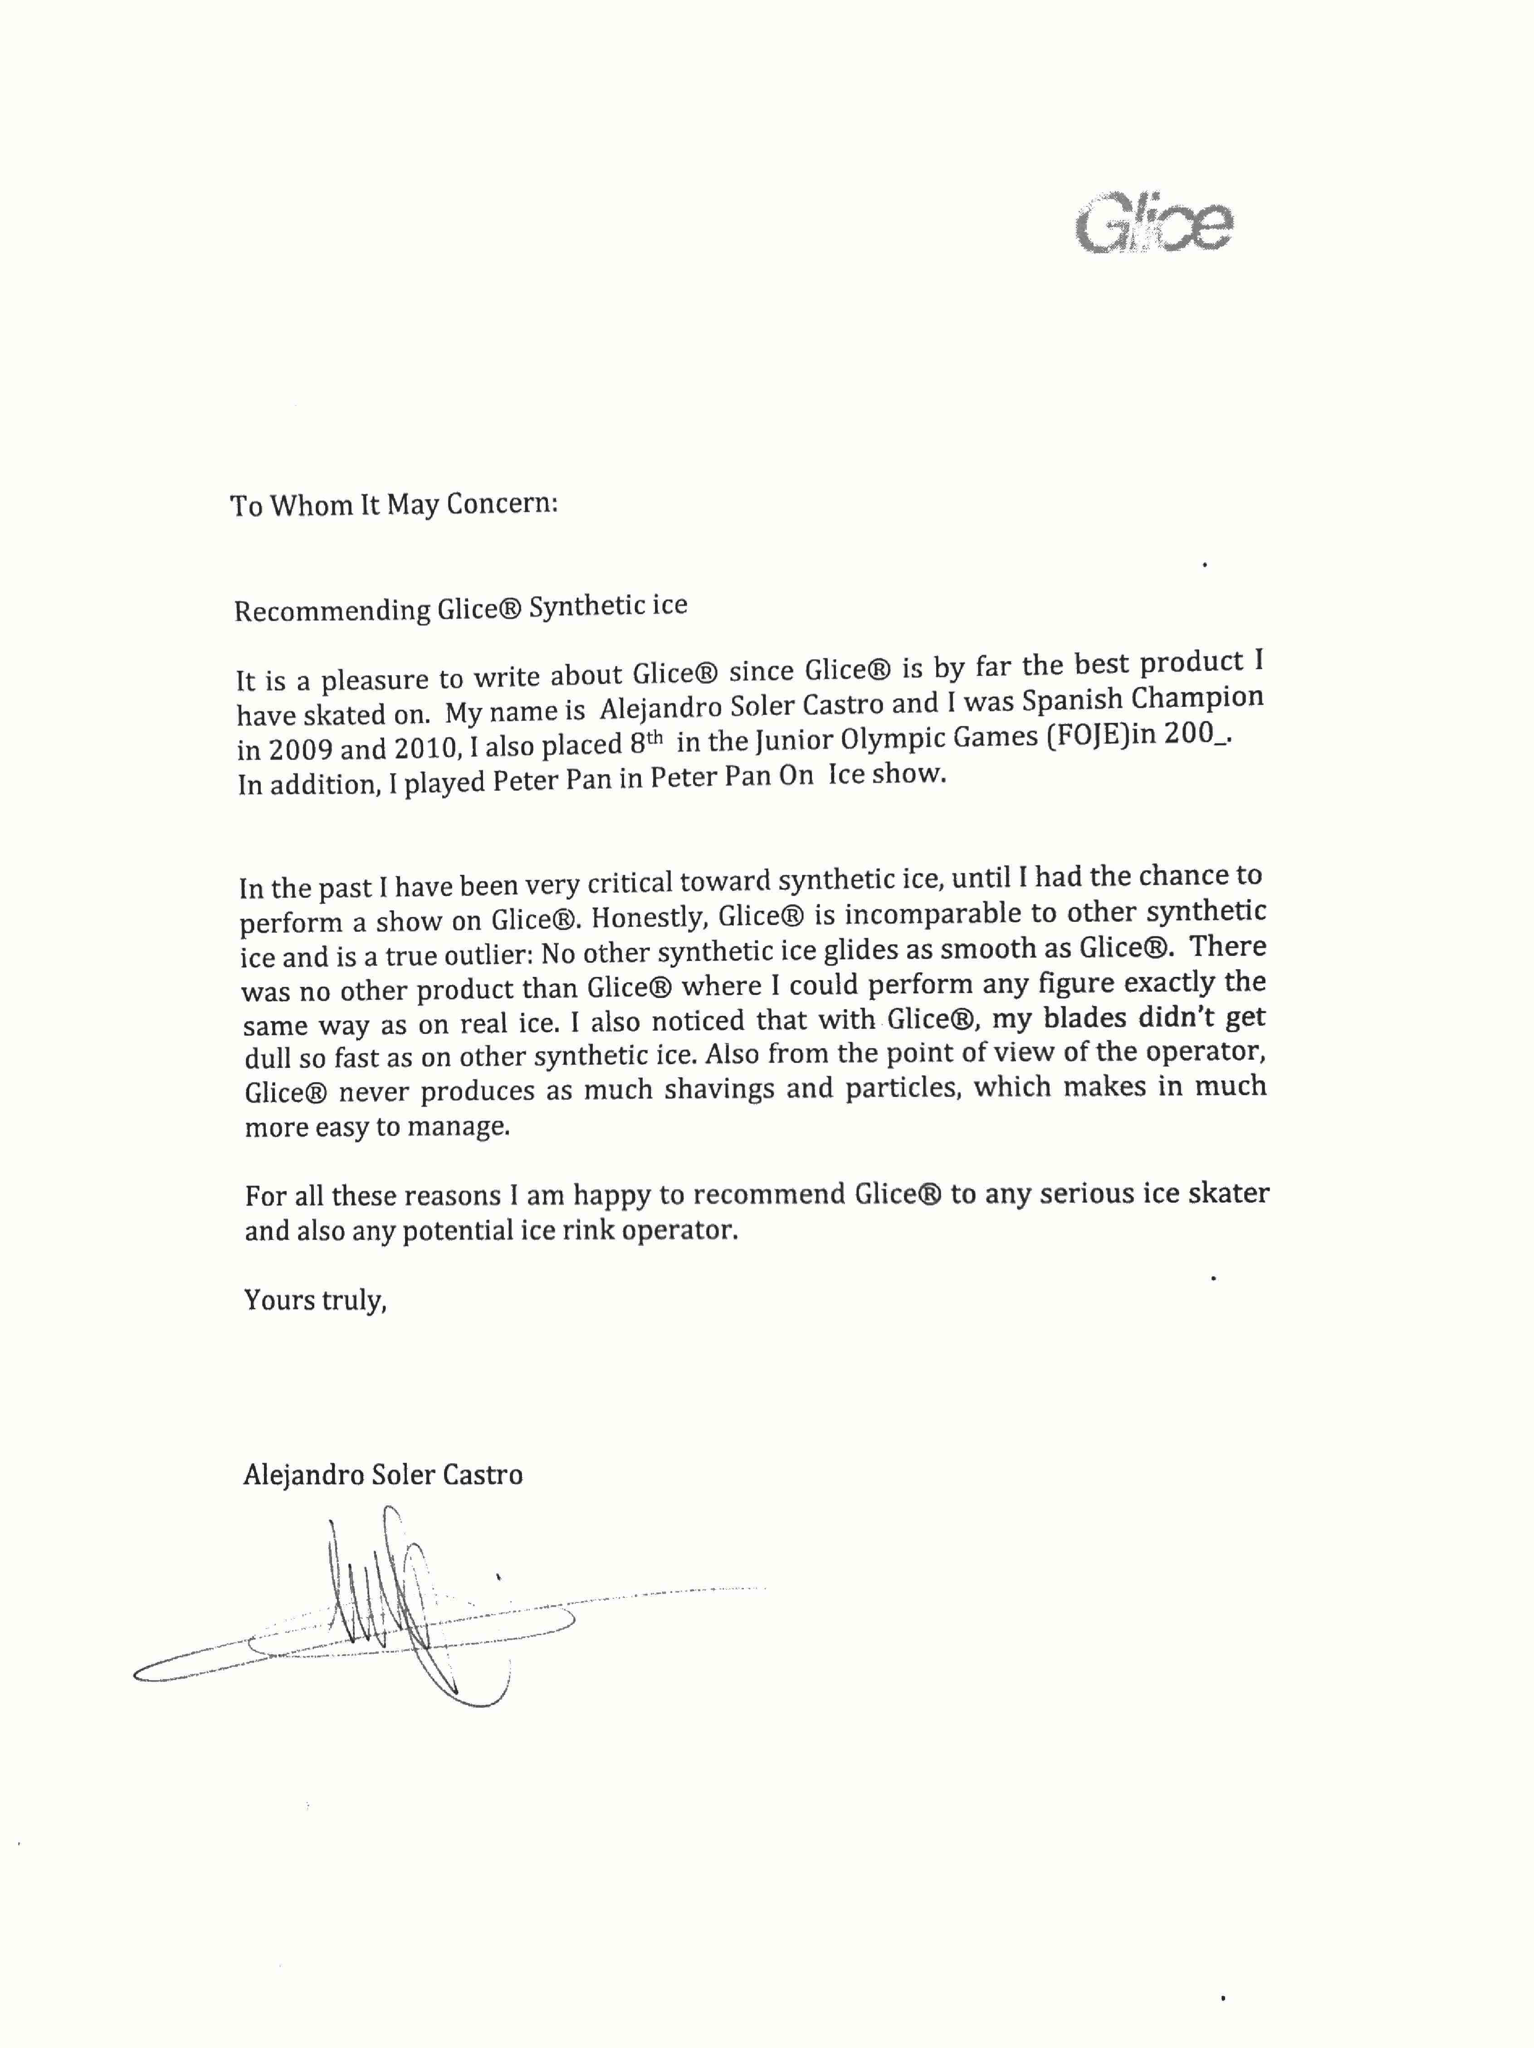 Letter Alejandro Solar Castro